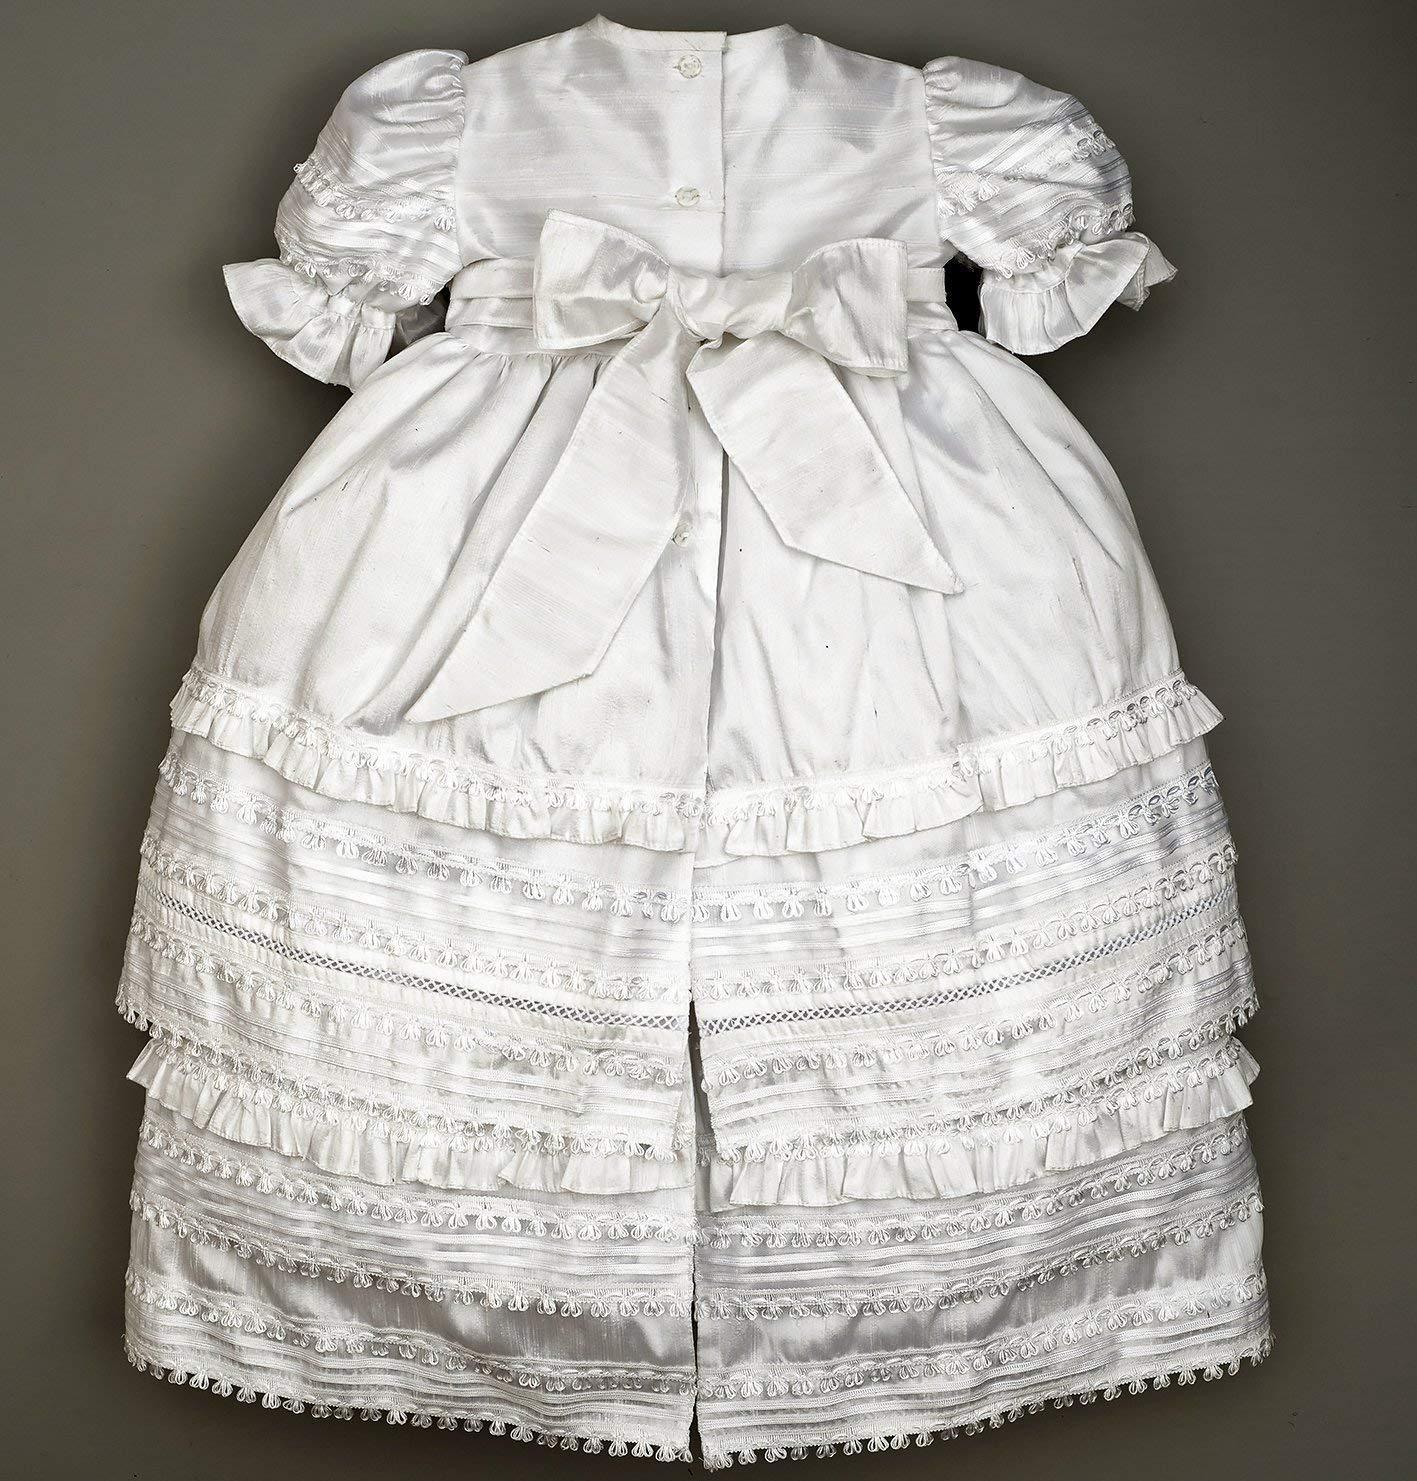 3de43886f Amazon.com: Beautiful Baby Girl Christening Gown Burbvus G002   Baptism  Heirloom Set, Matching Shoes & Bonnet   Handmade Baptism Dress Classical  Design: ...